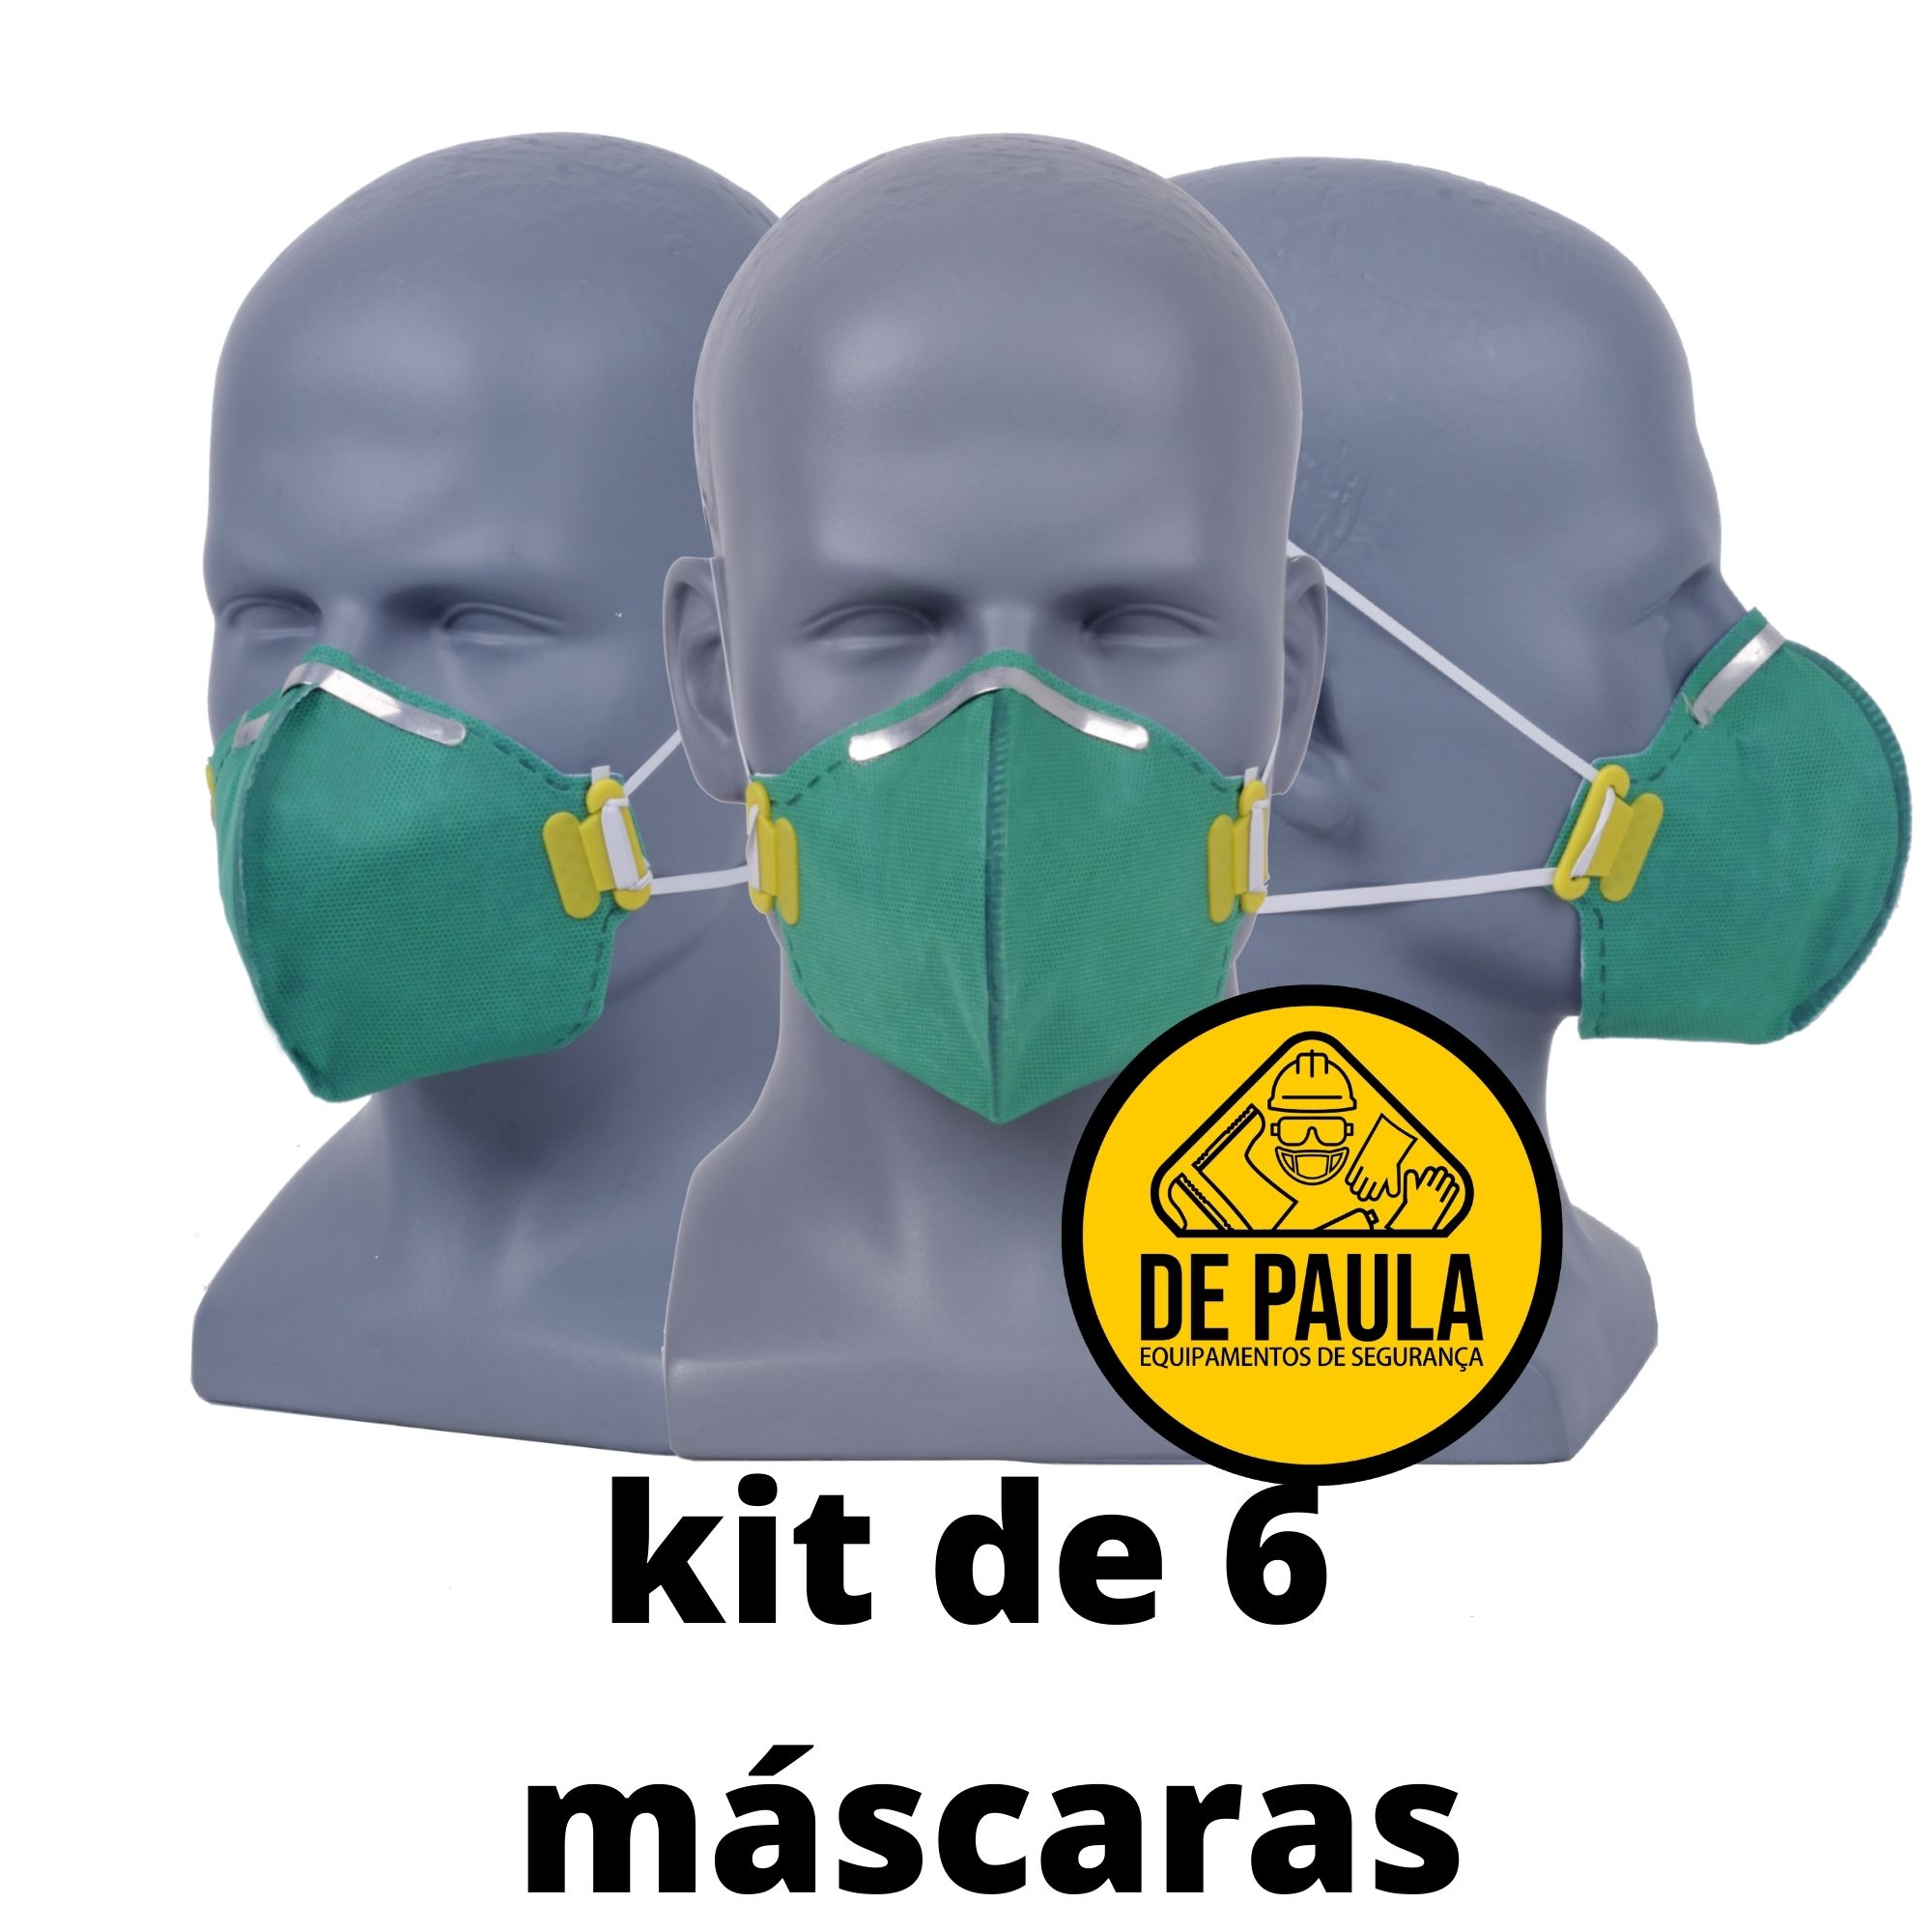 kit de 06 unidades de MÁSCARA DESCARTÁVEL PFF3 SEM VÁLVULA VERDE LUBEKA -CA38.834  - DE PAULA EPI